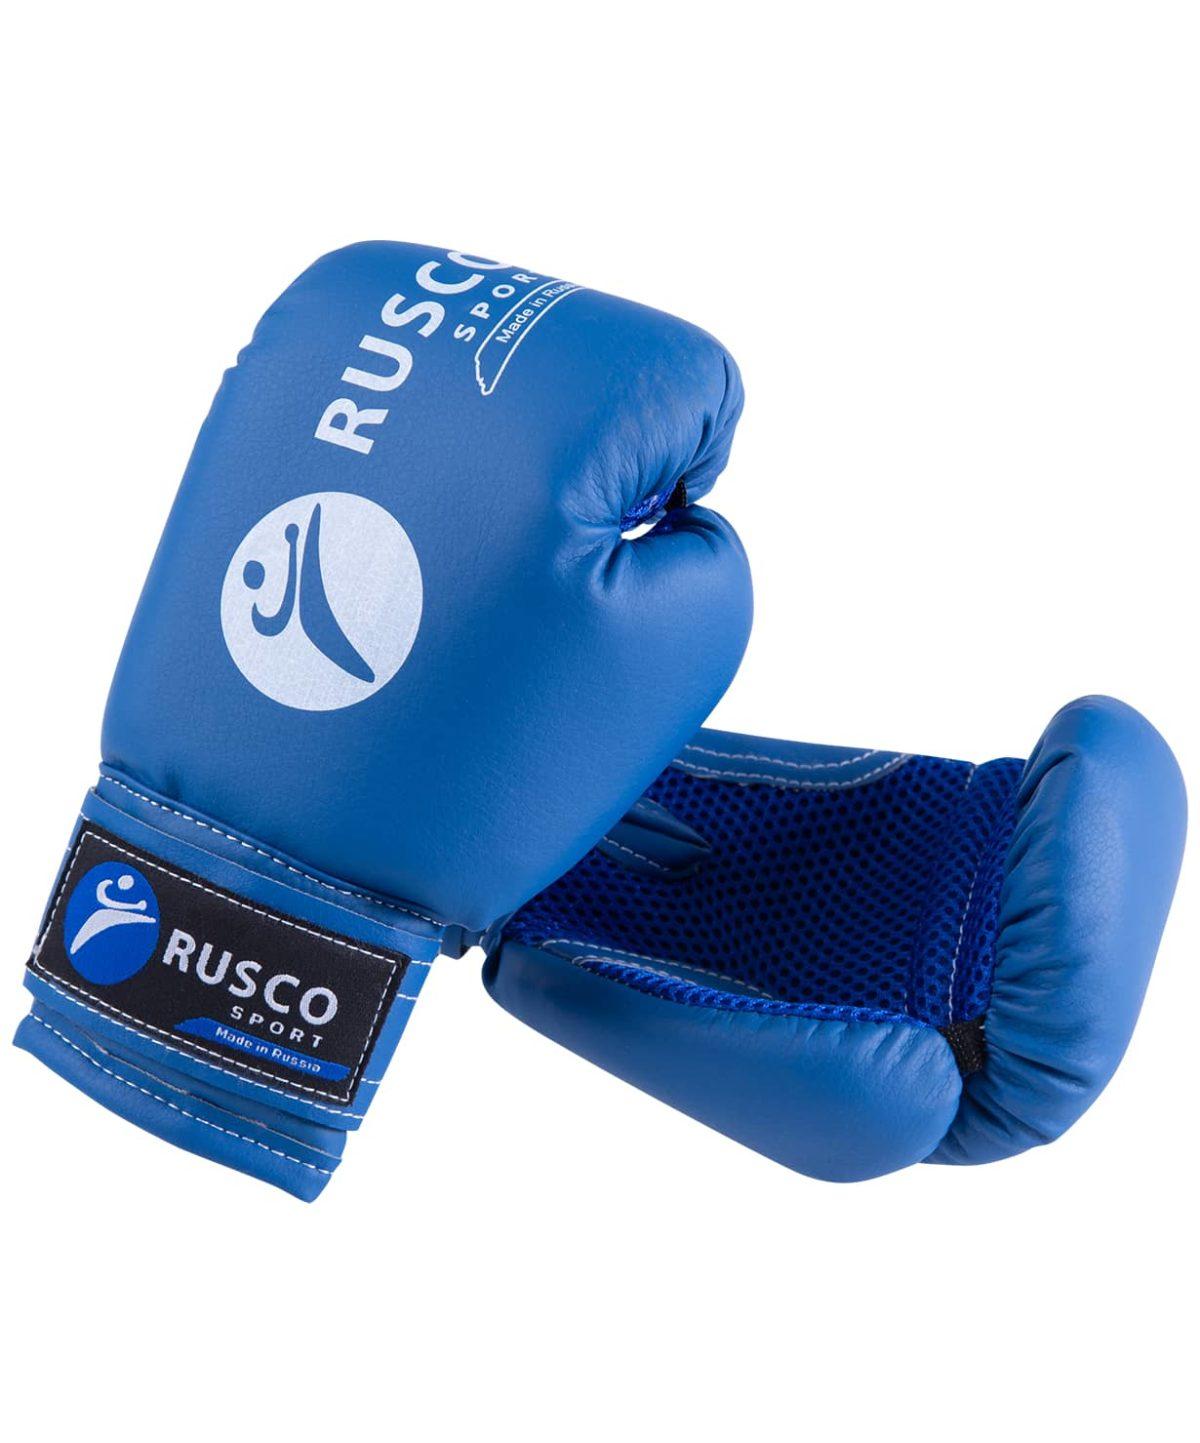 RUSCO Набор для бокса 6oz, к/з  18538 - 2